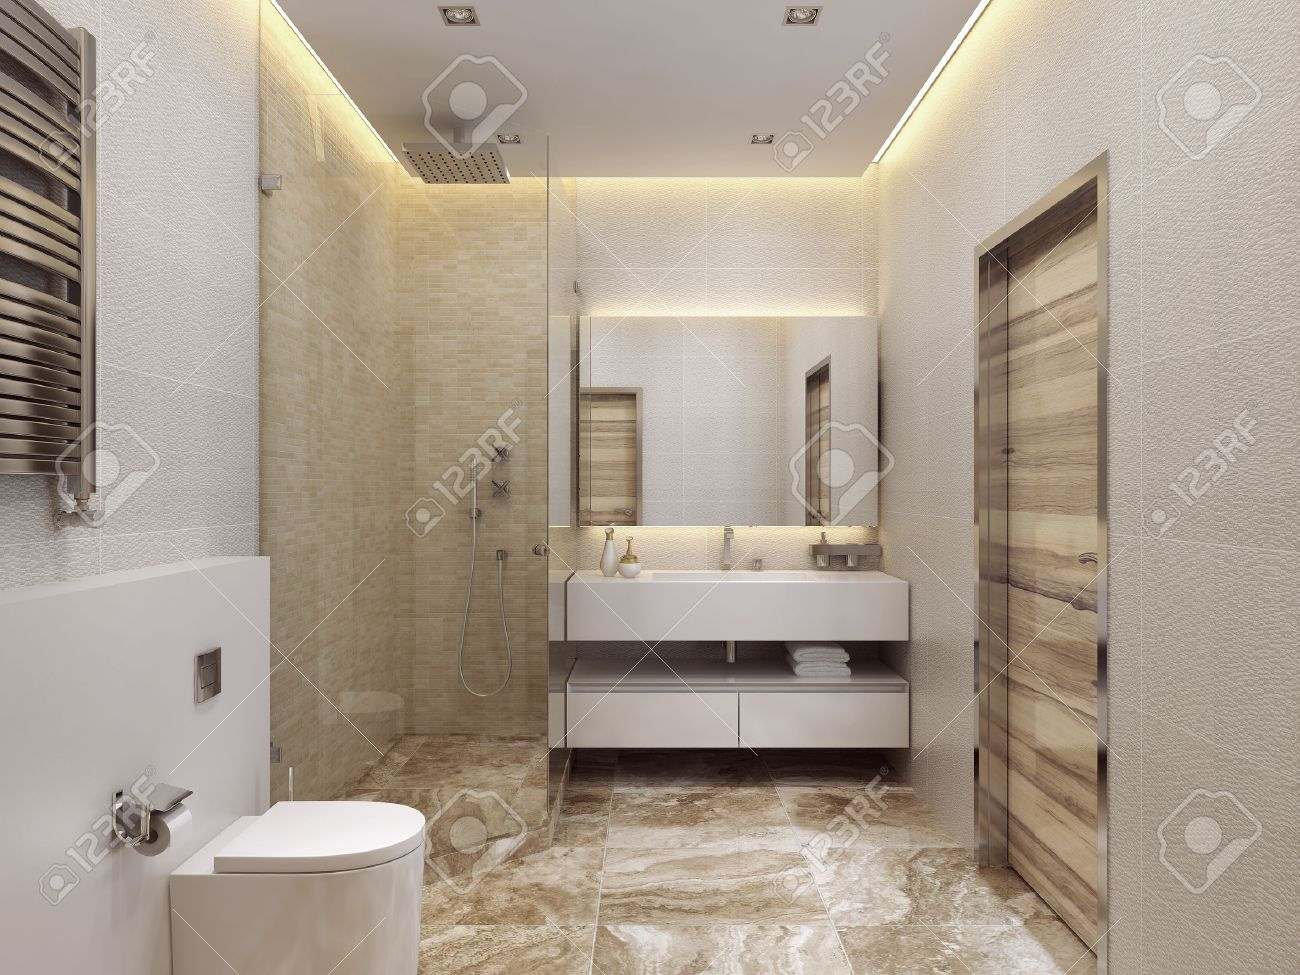 Design Modern Stil Badrum. Dusch Och Toalett. Den Gula, Vita Och ...